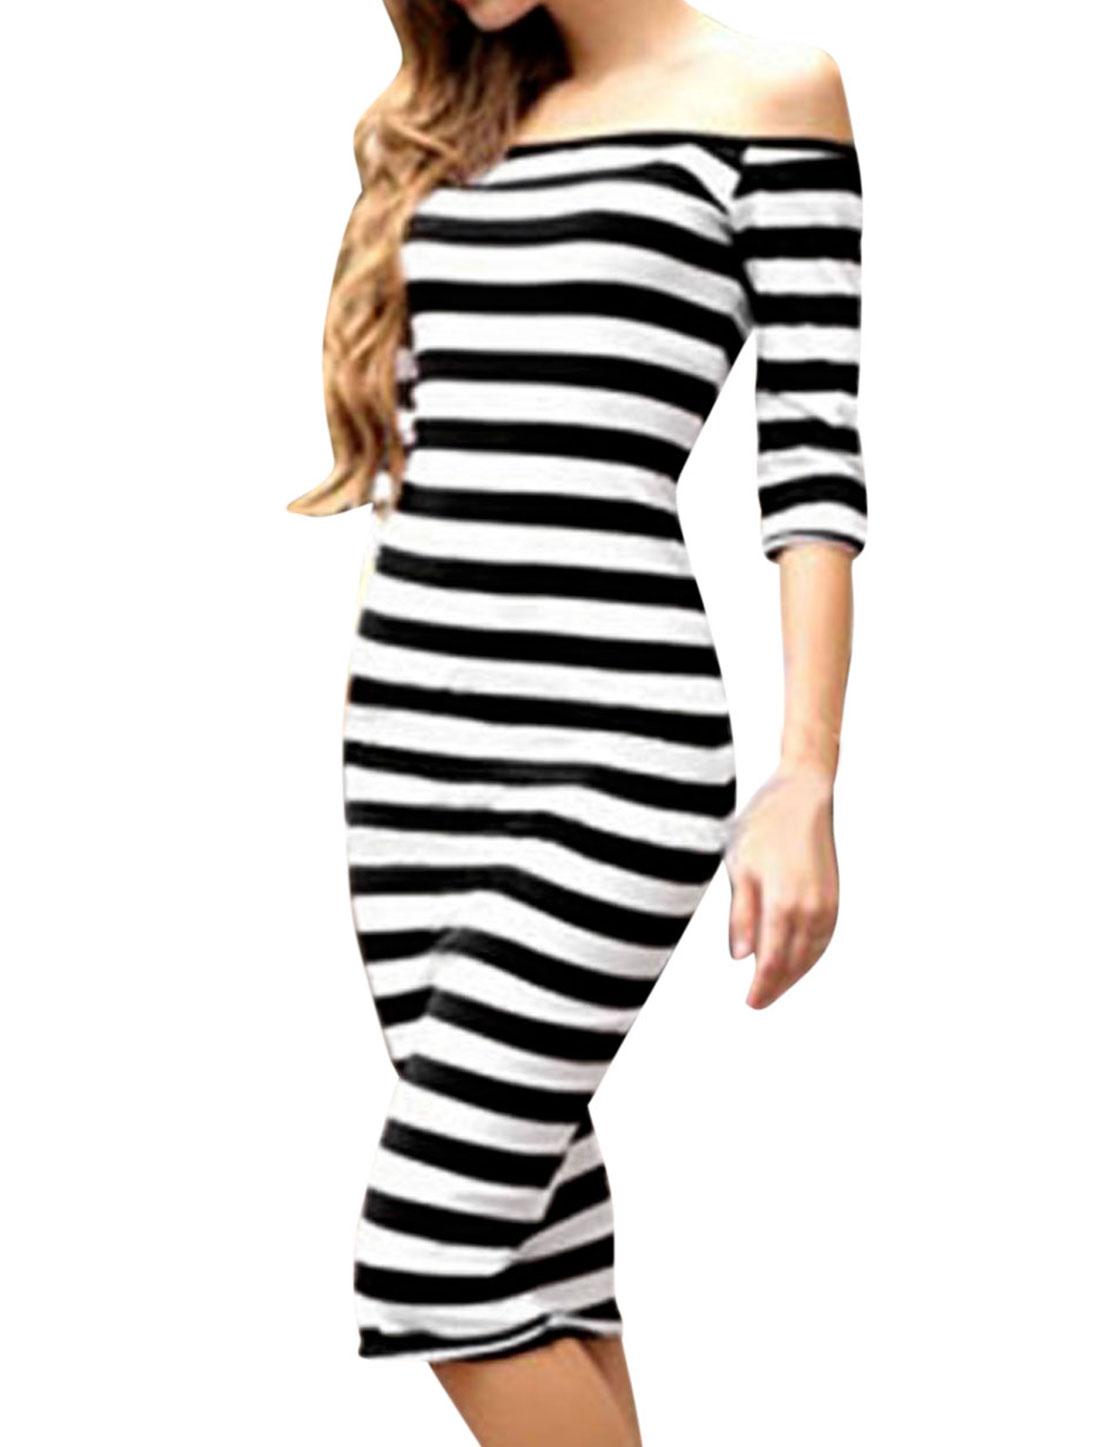 Woman Stripes Off Shoulder Three Quarter Sleeves Sheath Dress Black White M